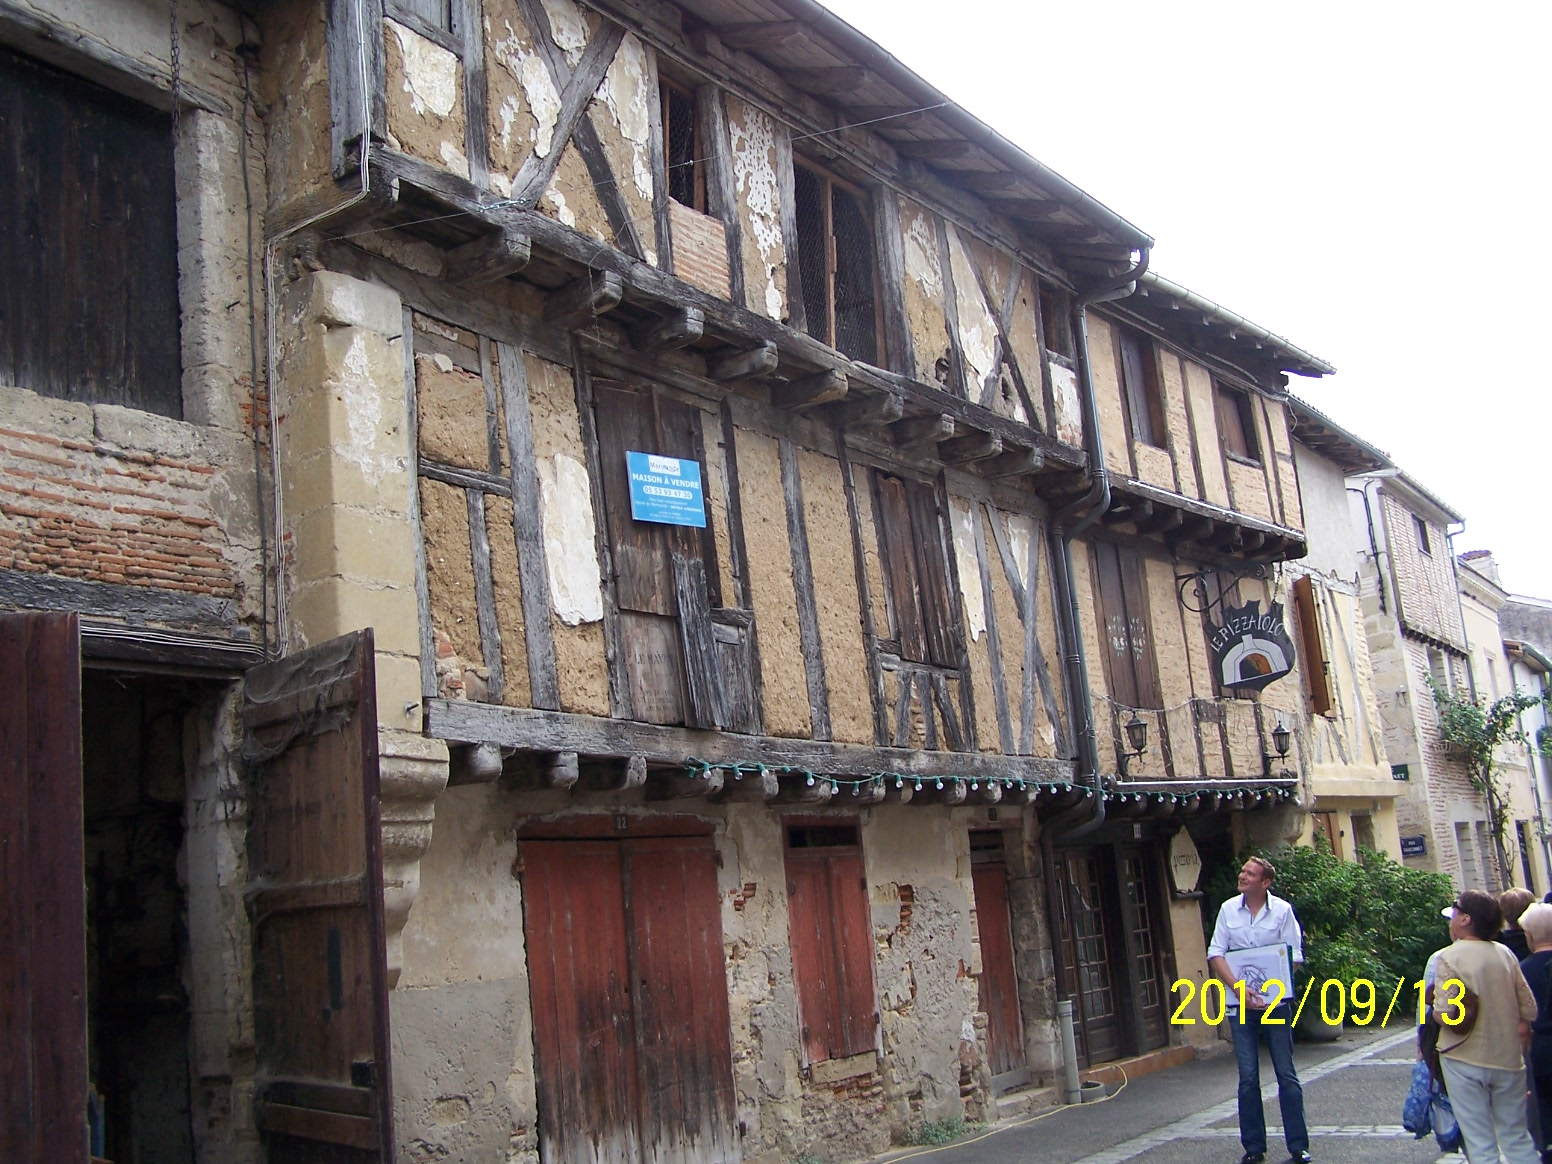 Visite de marmande blog senioriales - Office de tourisme de marmande ...